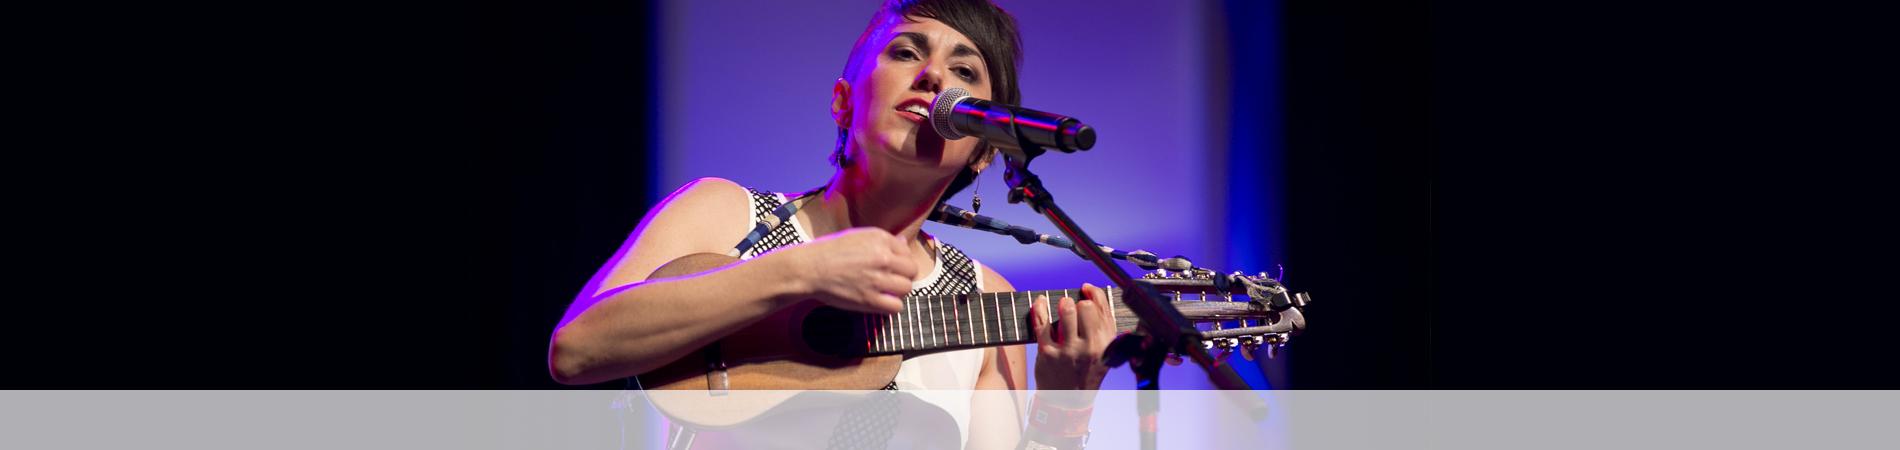 Gina Chavez live at the Austin Music Awards